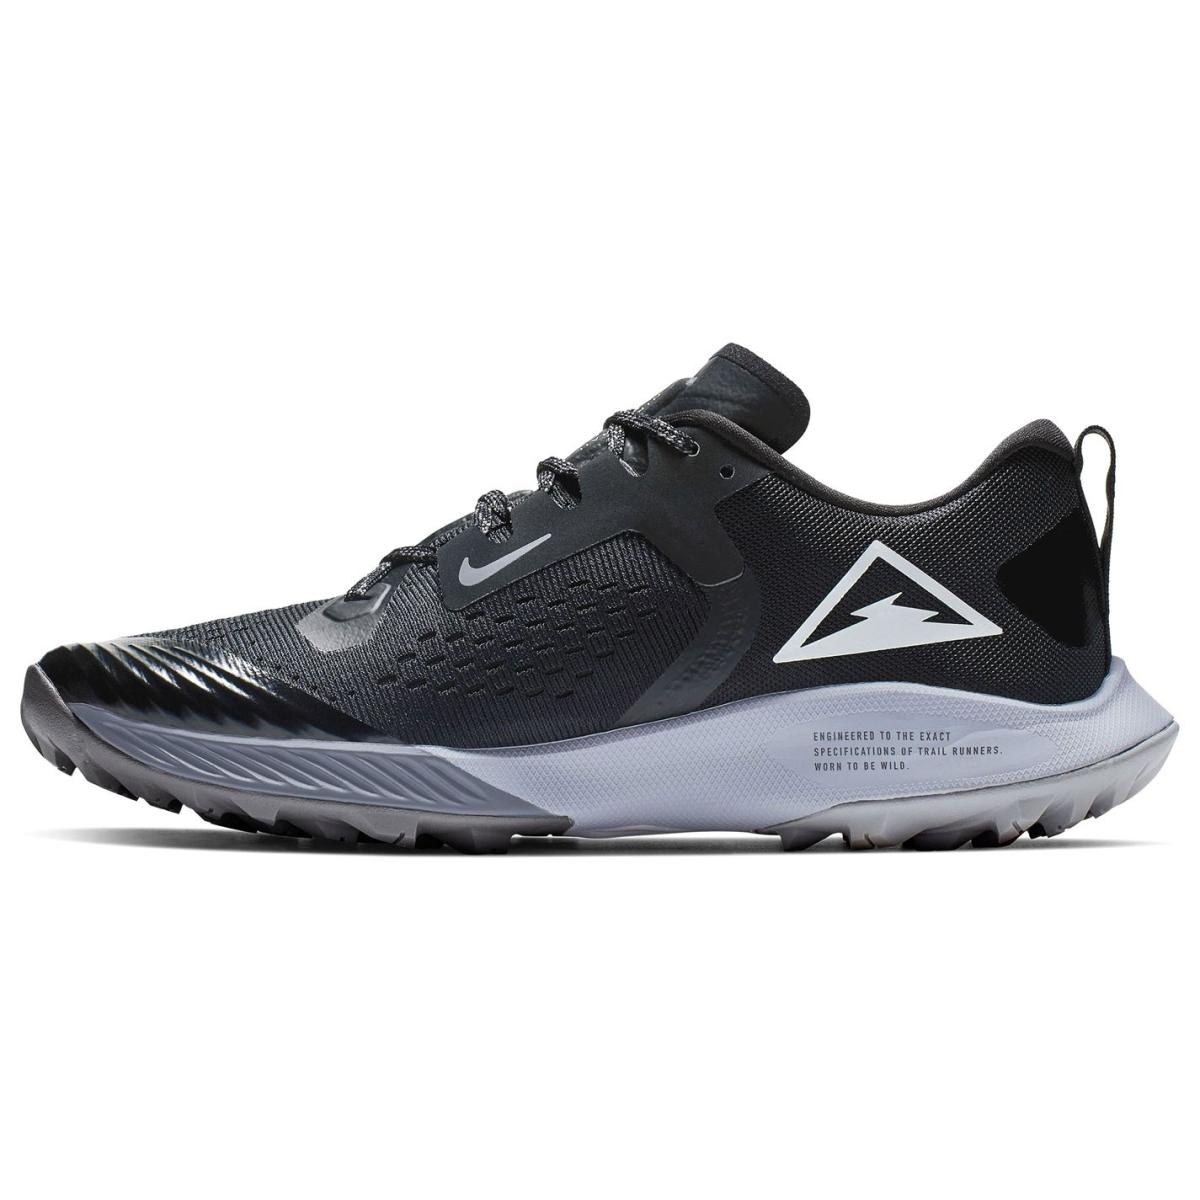 Nike Terra Kiger 5 Turnschuhe Damen Sneaker Sportschuhe Laufschuhe 6021